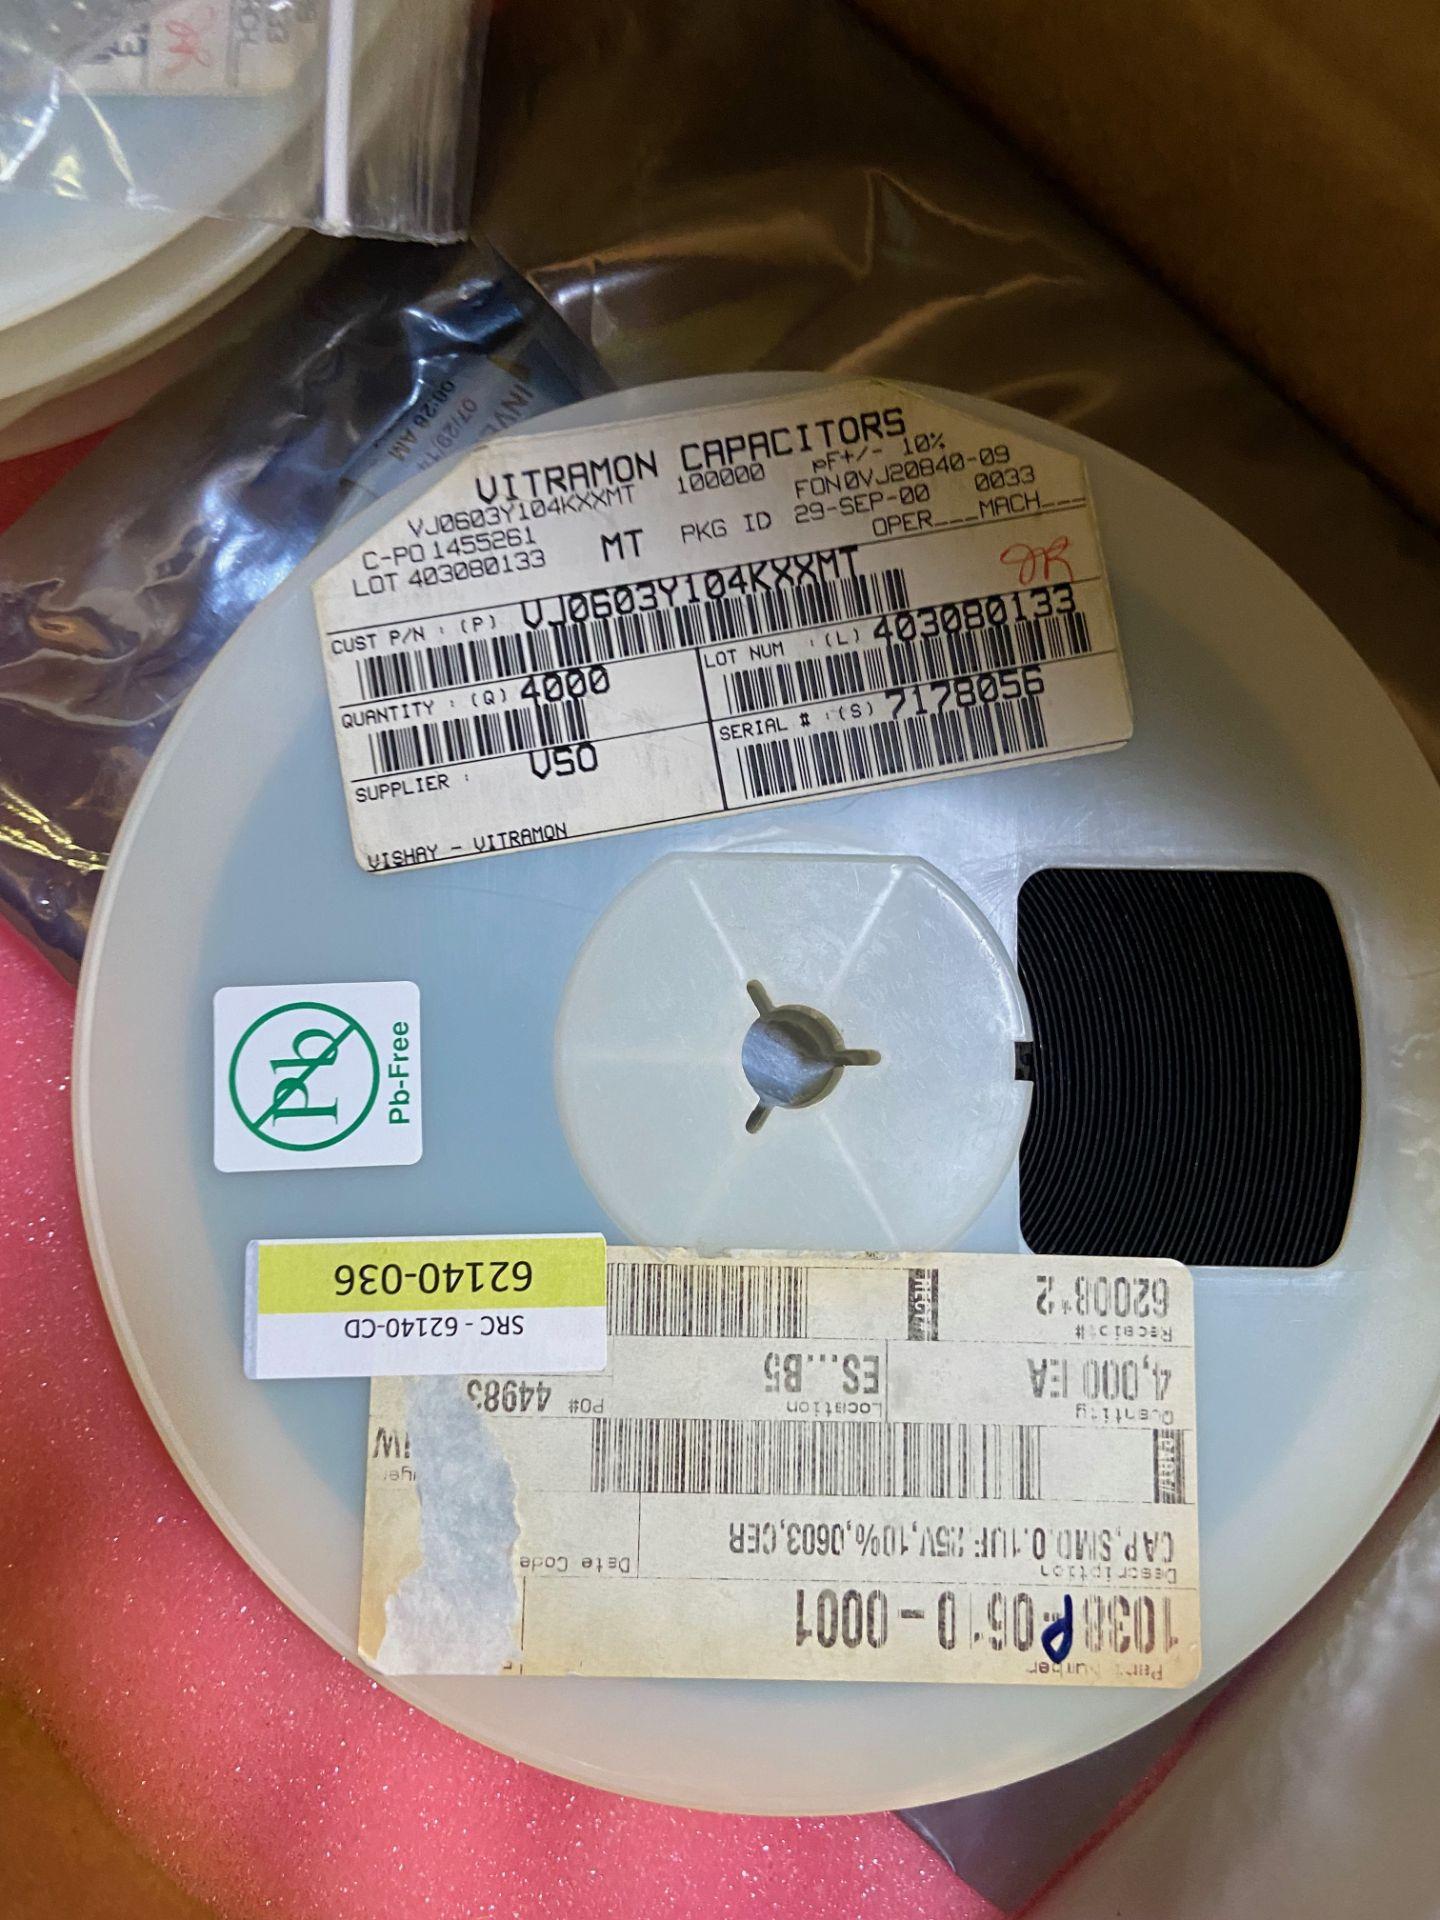 Vishay VJ0603Y104KXXMT, Cap Ceramic 0.1uF 25V X7R 10% Pad SMD 0603 150°C Automotive T/R, APROX QTY - Image 11 of 15